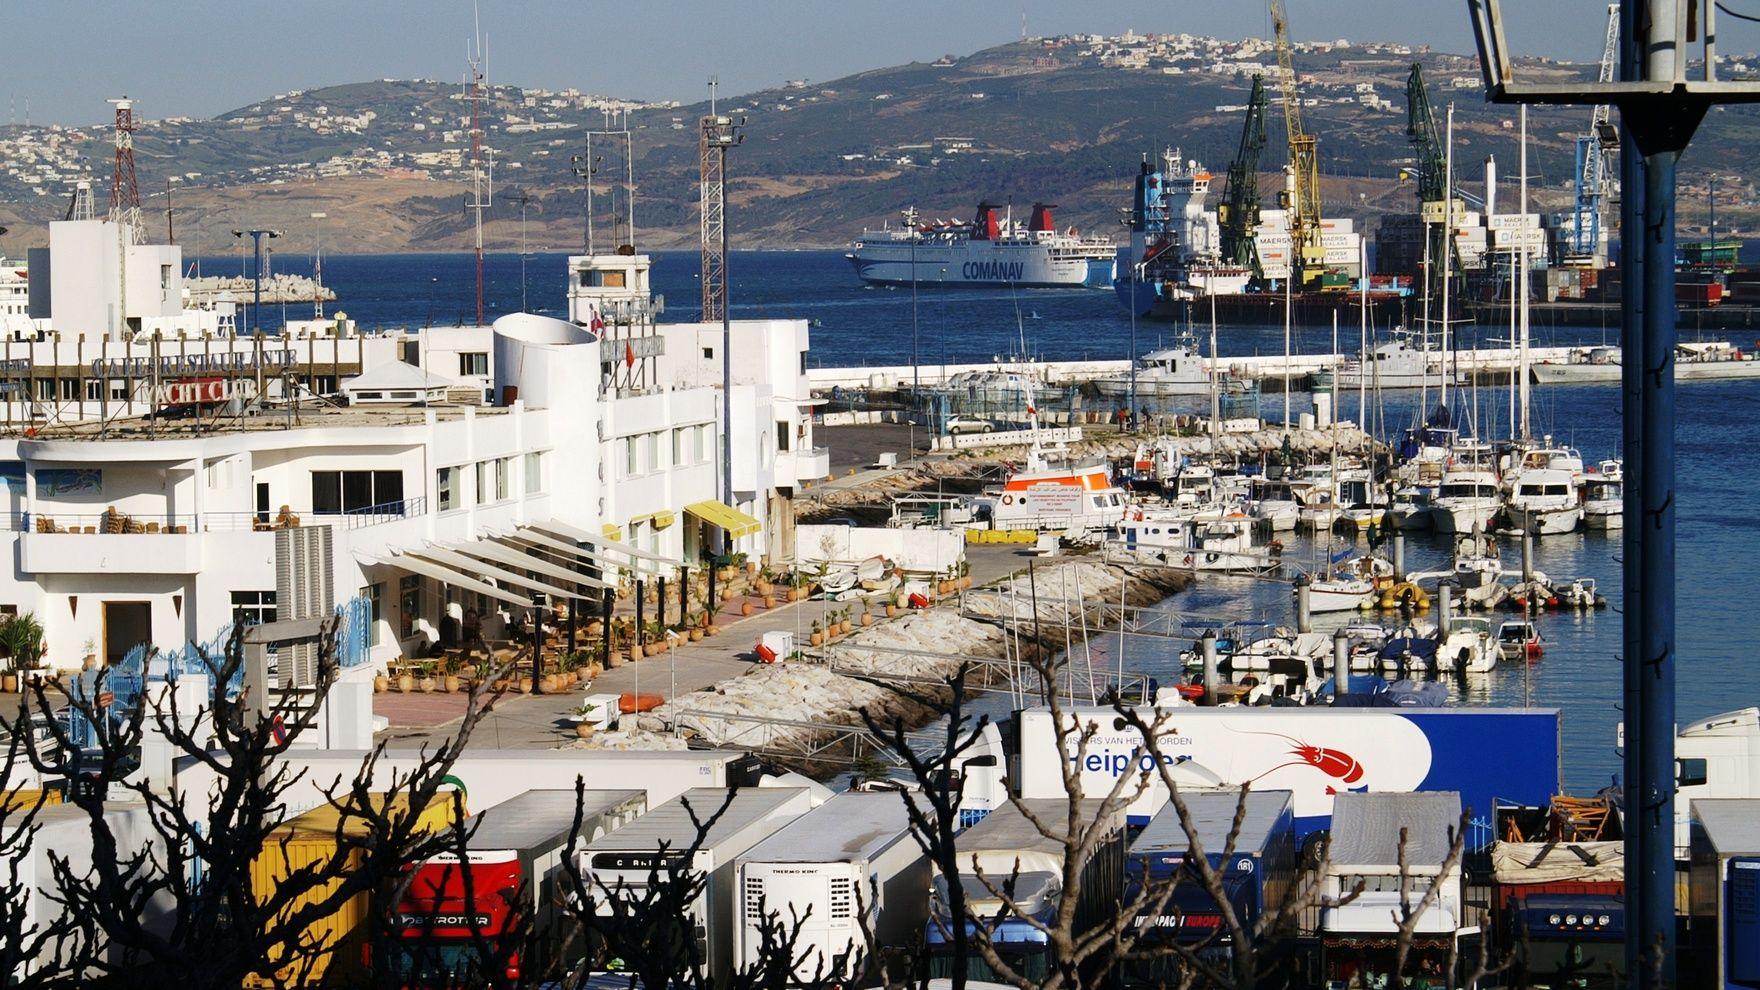 A cruise: Spain - Morocco - Canary Islands